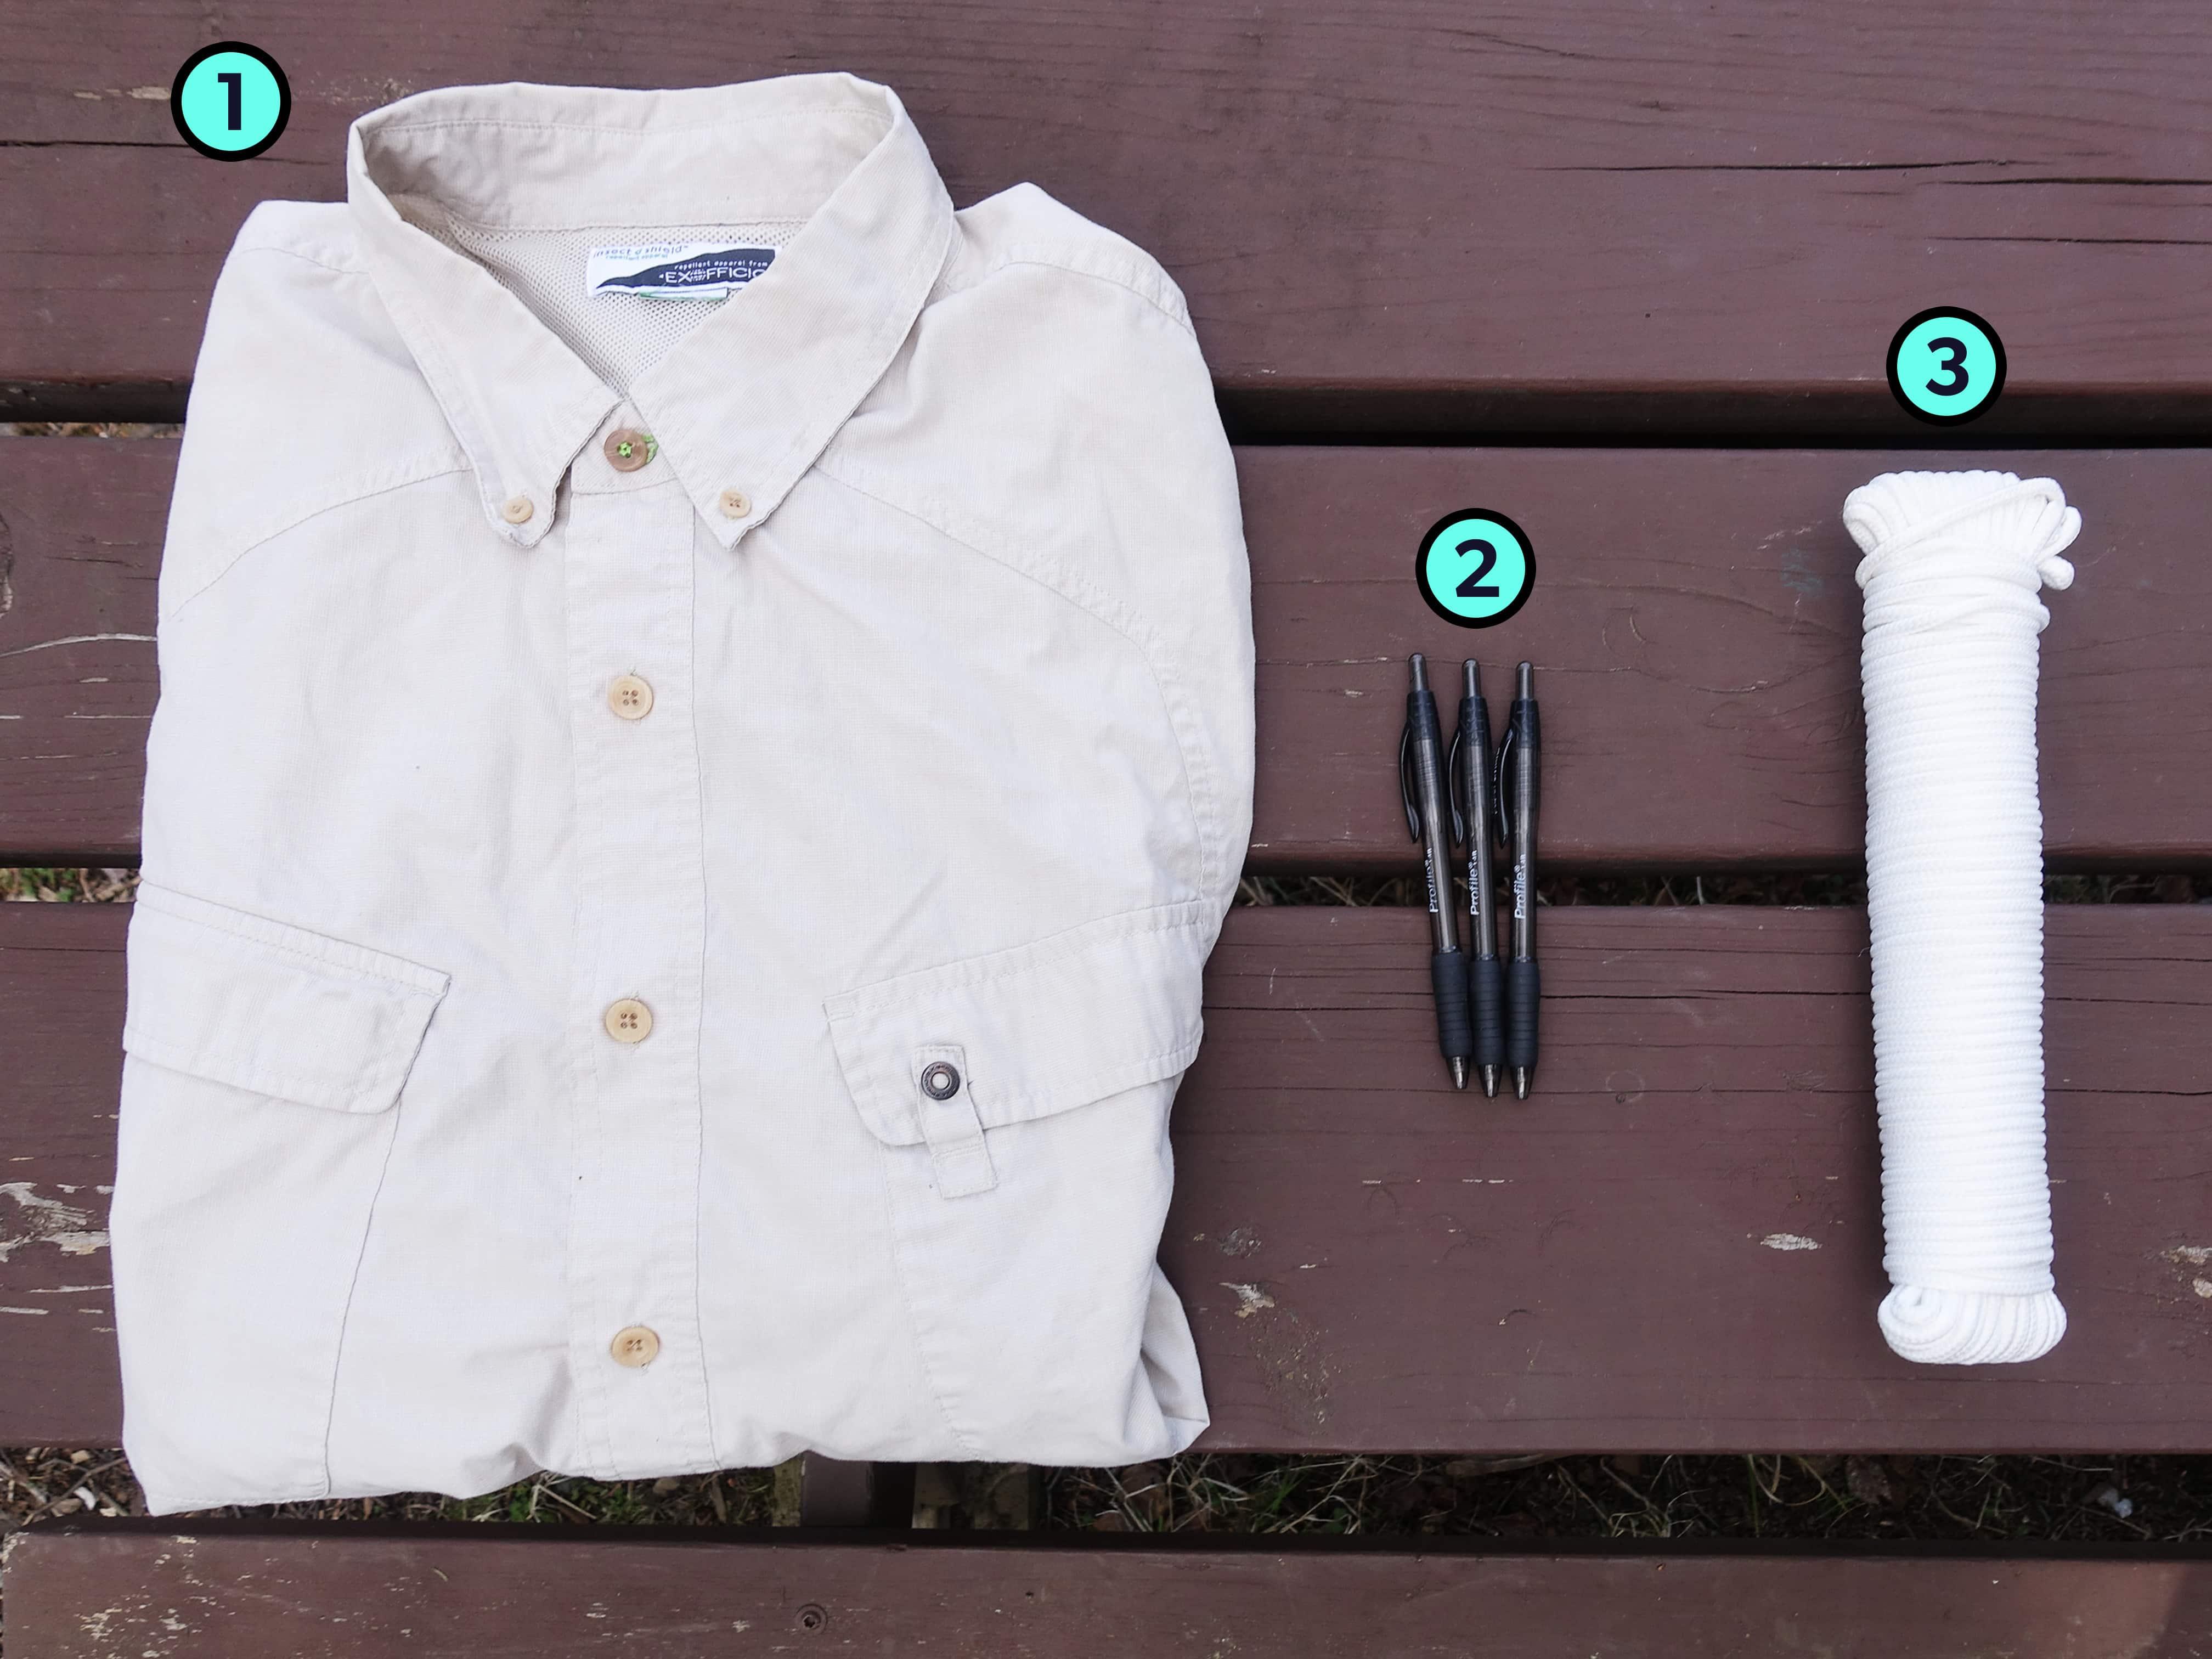 John's Trusty Three Travel Gear Items